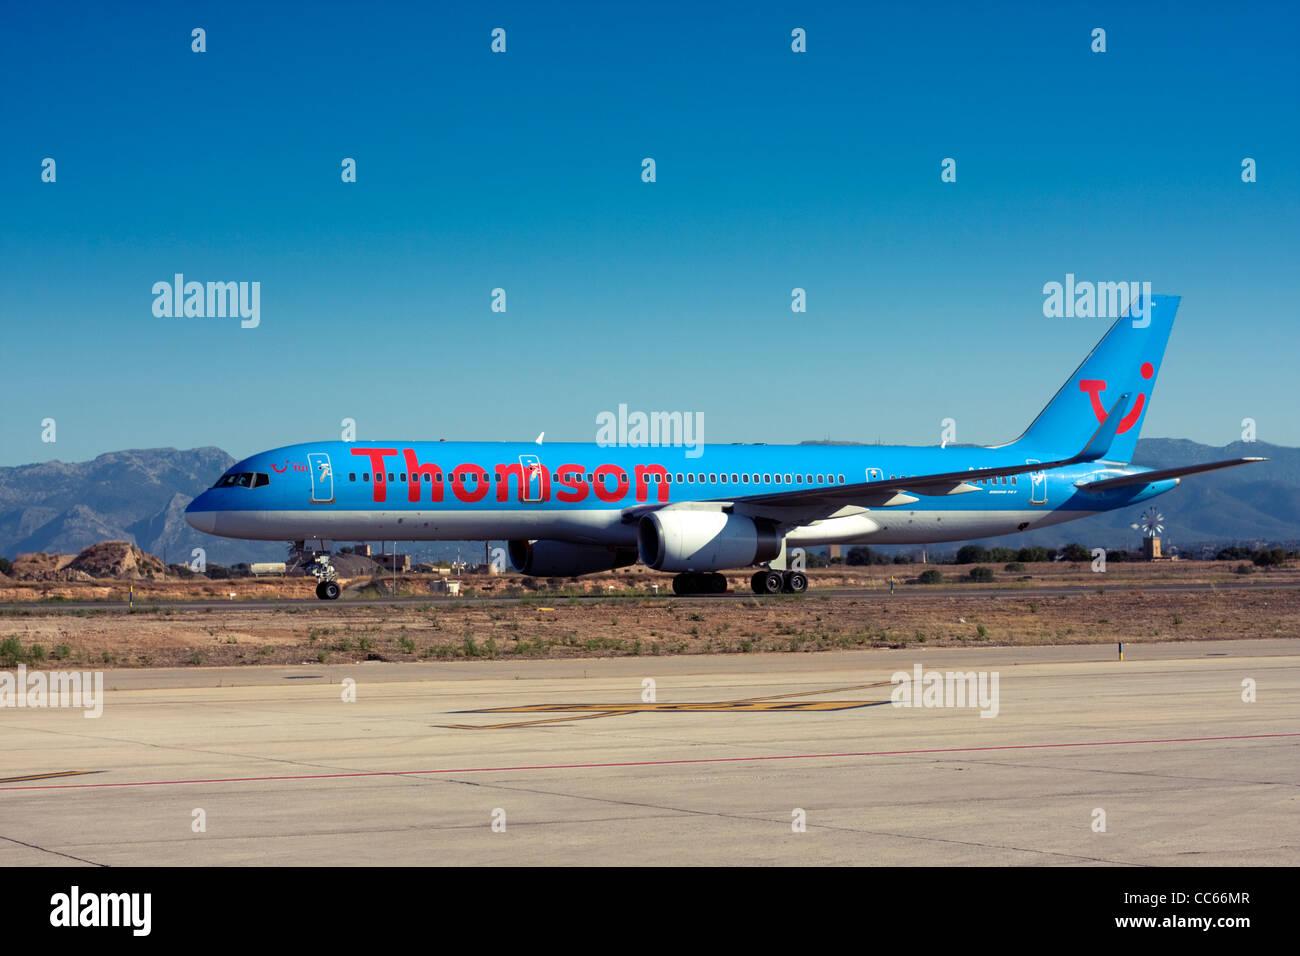 Thomson Airways Boeing 757 at Palma de Mallorca, Son San Juan Airport, Majorca, Spain - Stock Image